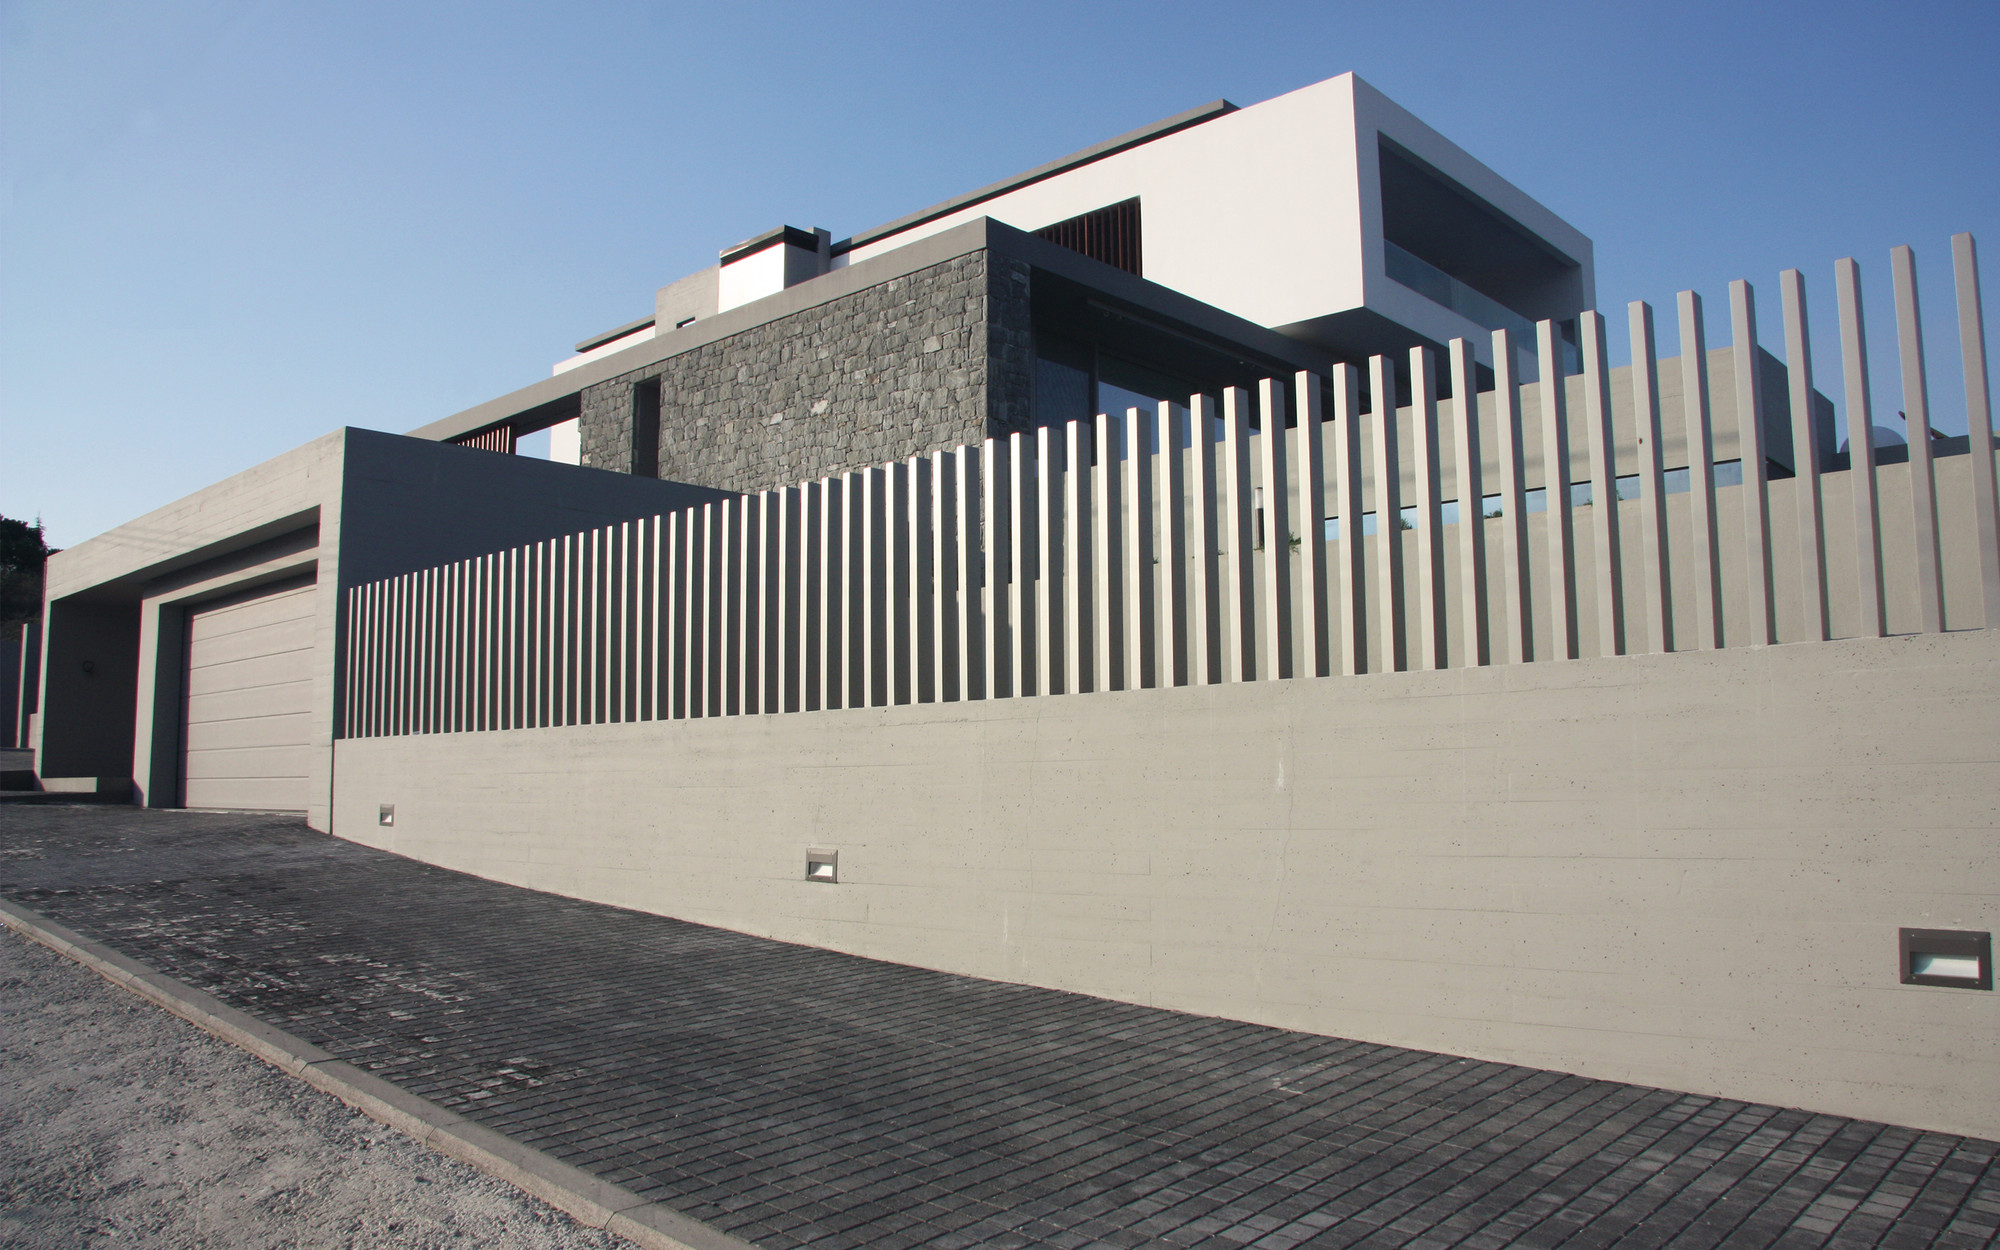 B House / Office Twentyfive Architects